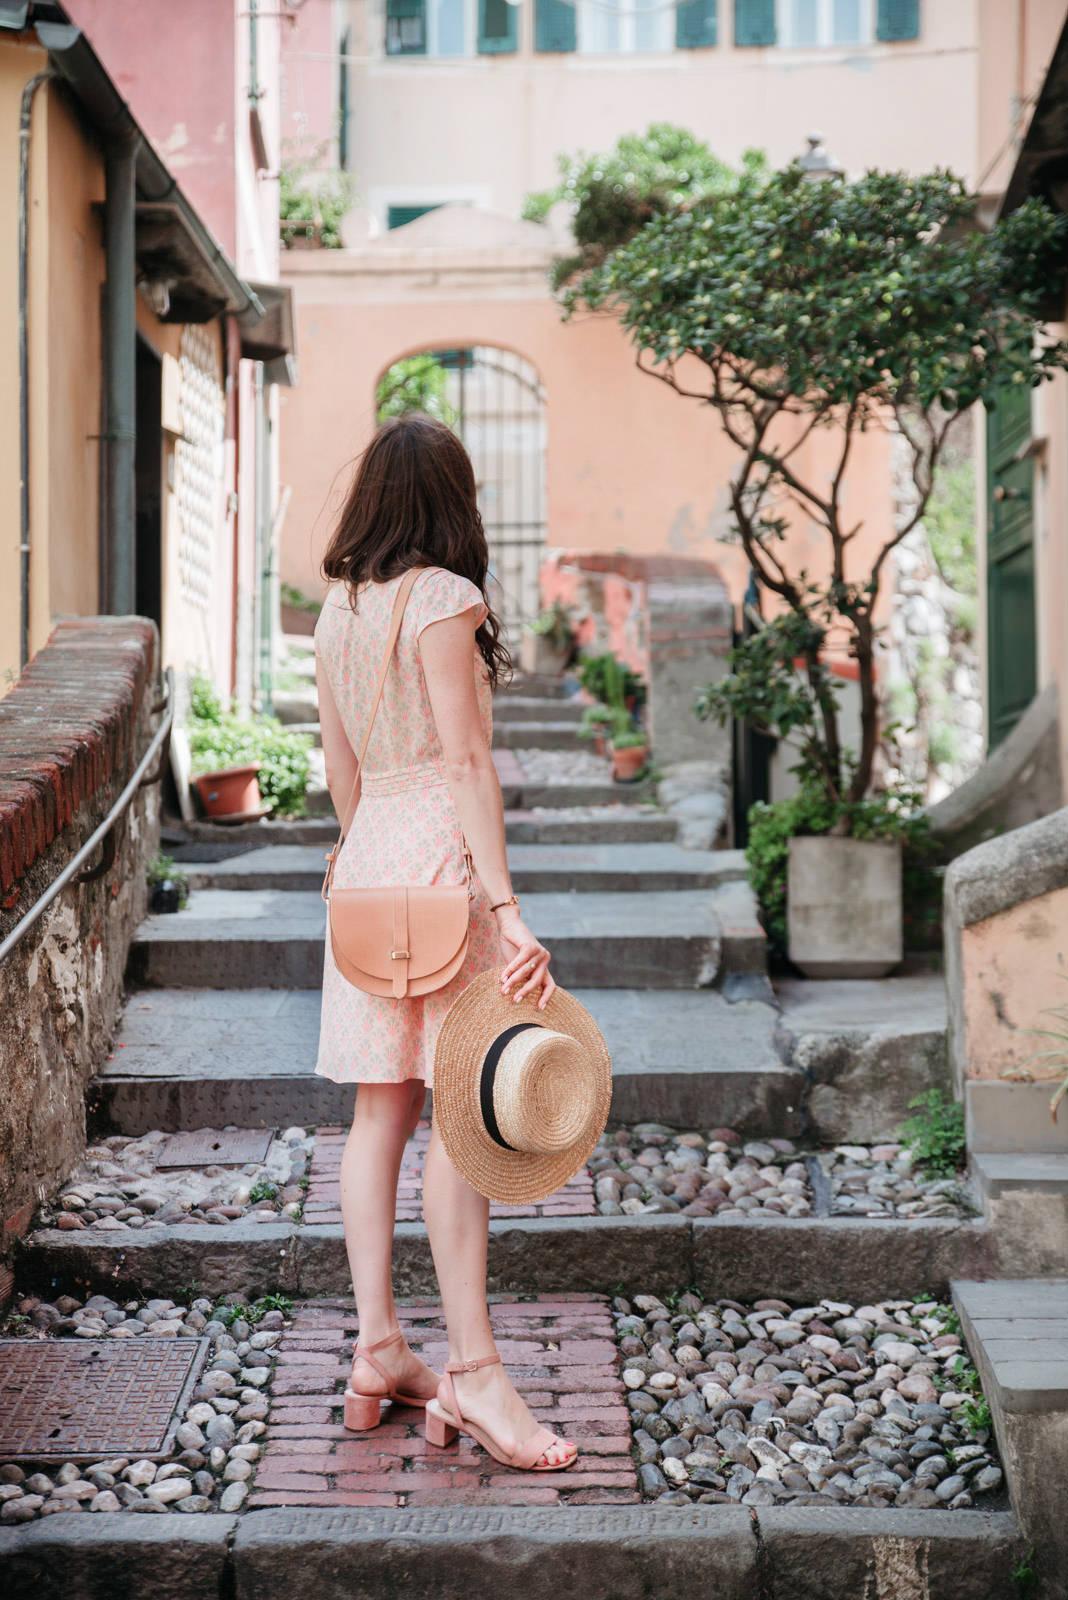 Blog-Mode-And-The-City-Lifestyle-Italie-Bocadasse-Camogli-Sestri-Levante-11